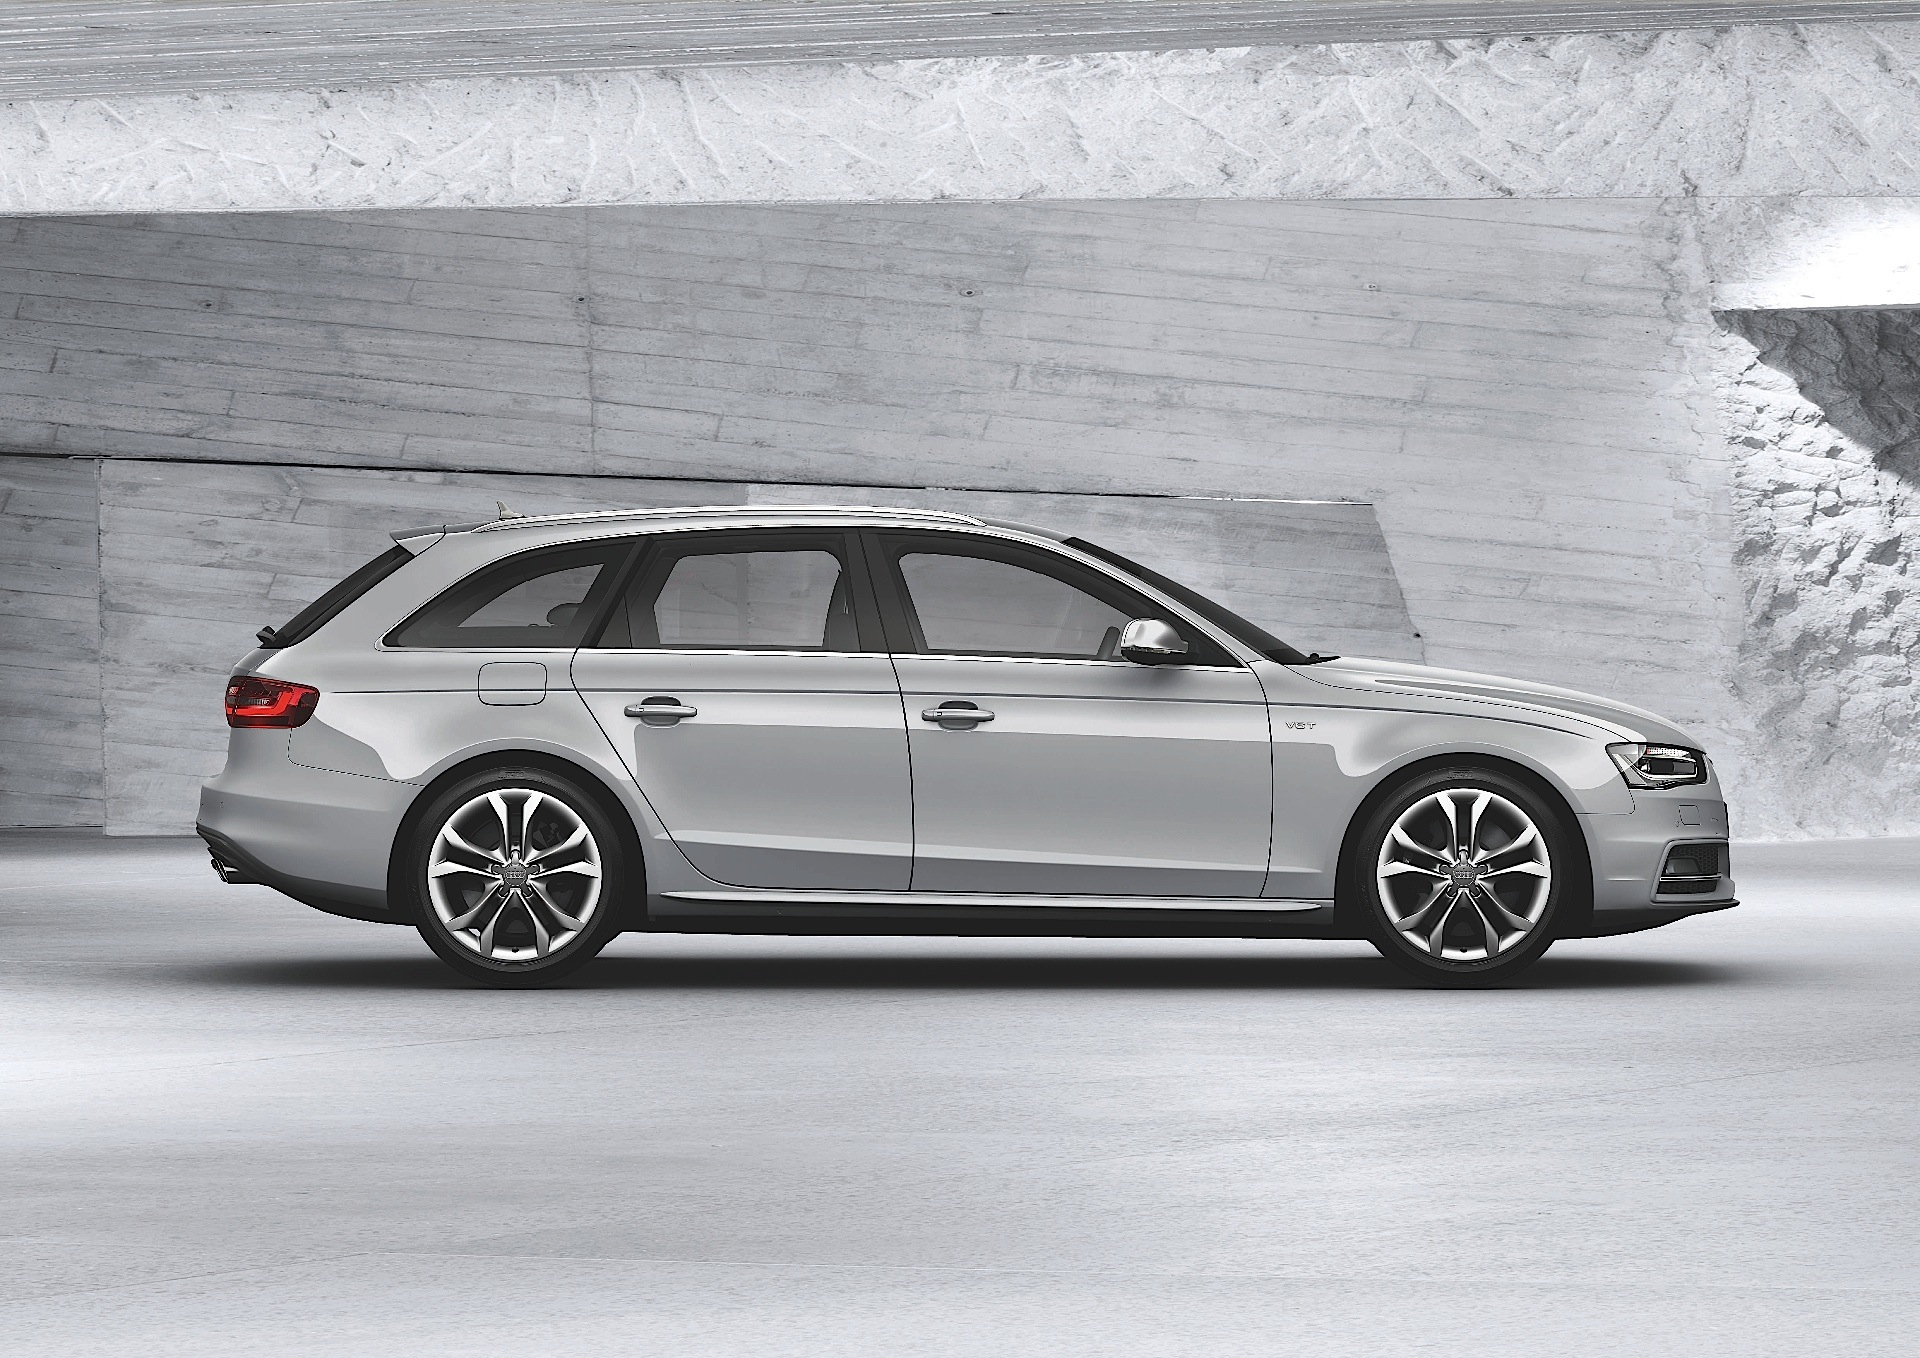 AUDI S Avant Specs Autoevolution - Audi s4 avant